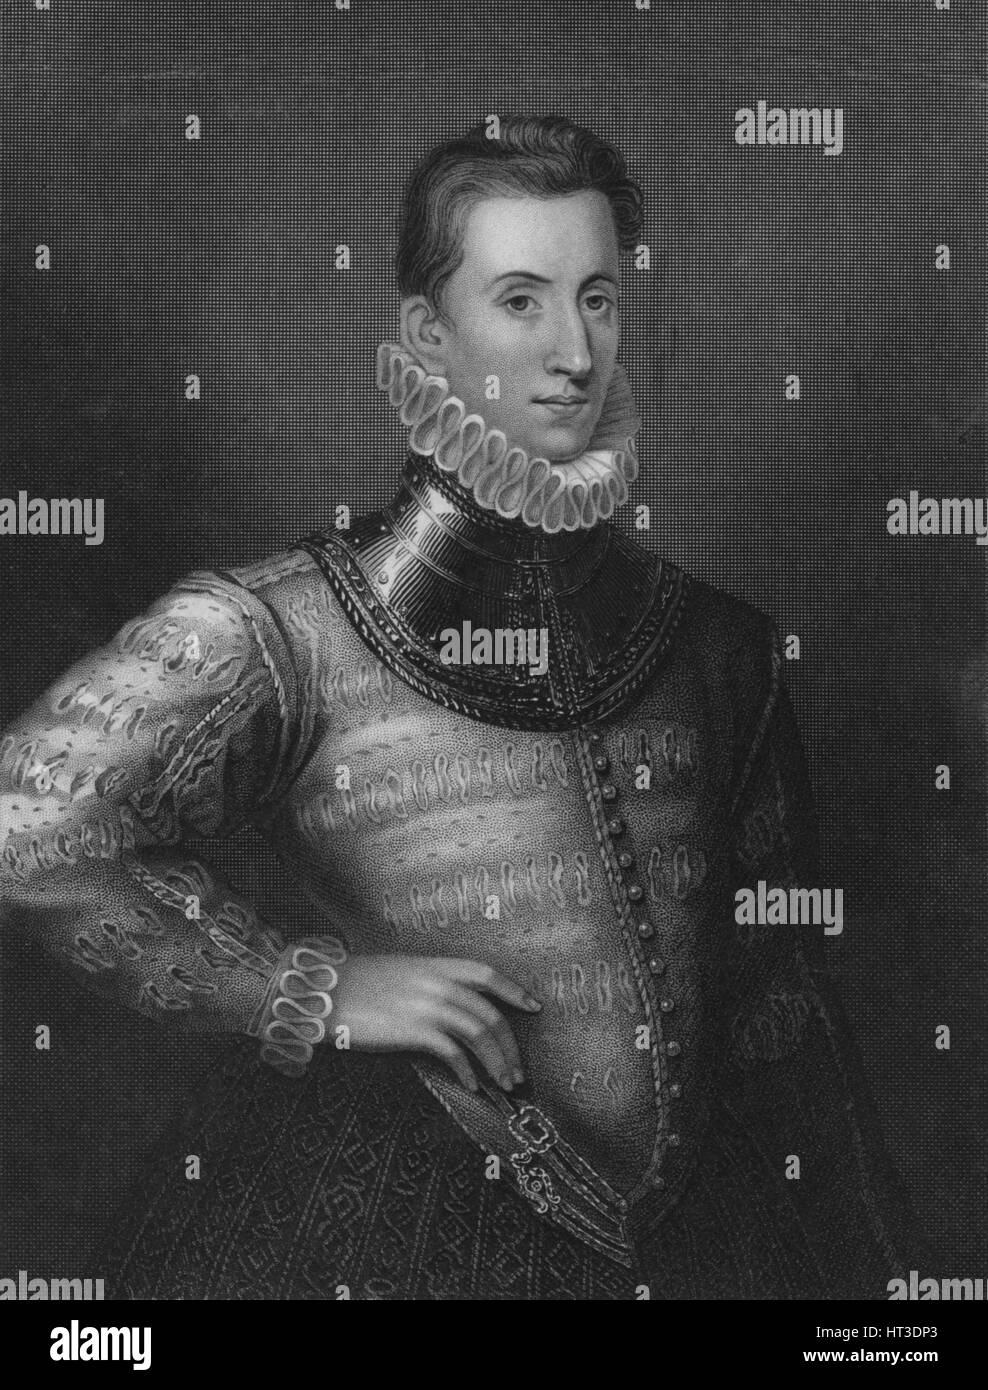 'Sir Philip Sidney', 1838. Artist: Henry Robinson. - Stock Image